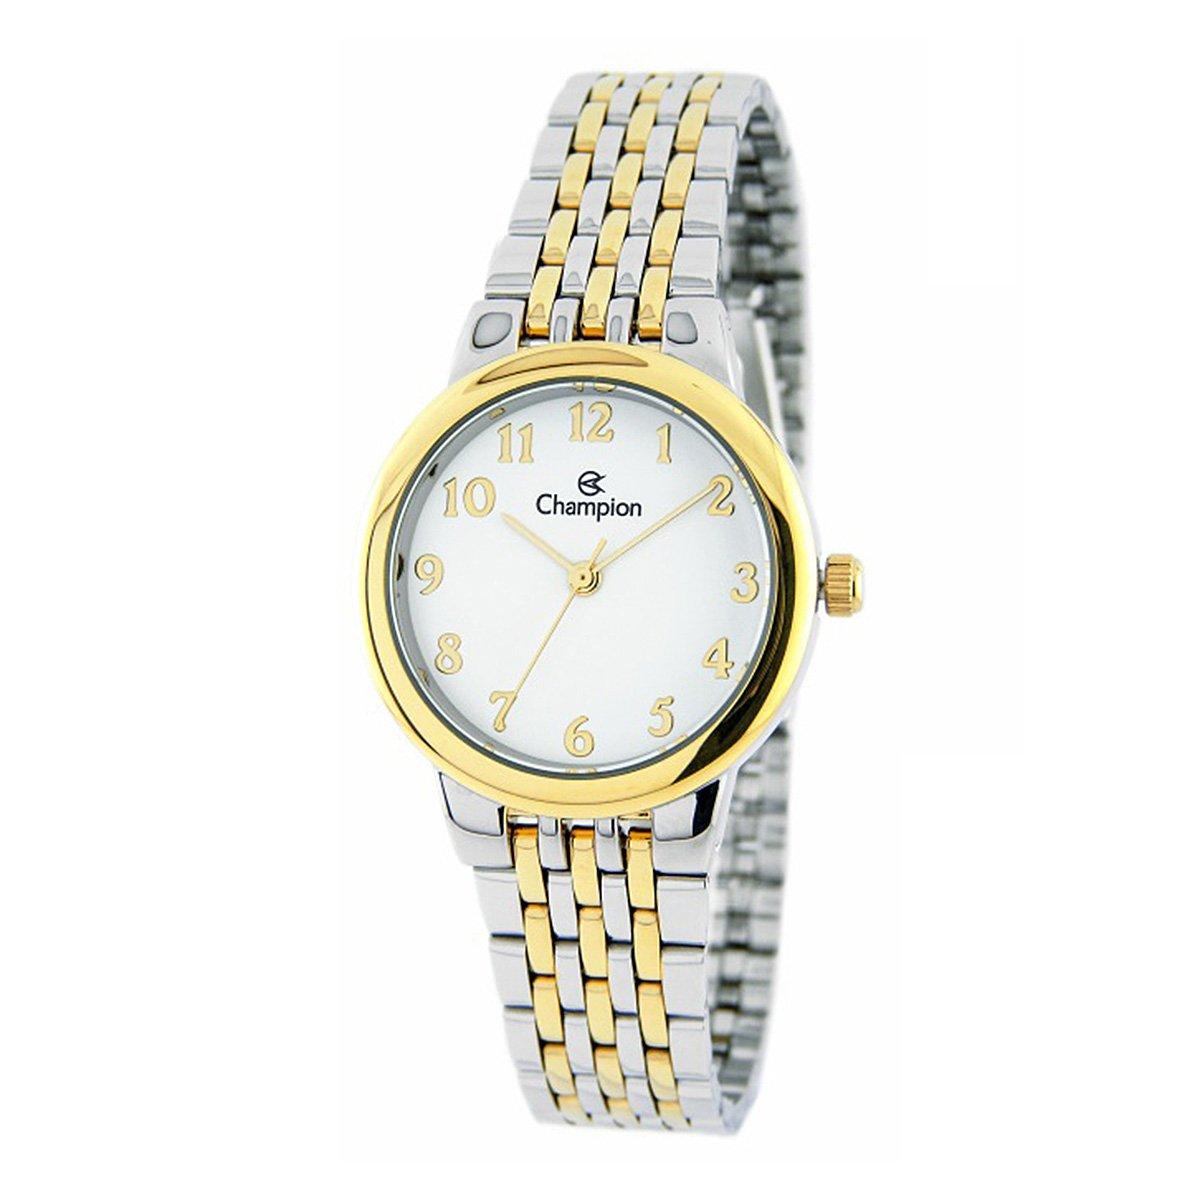 319068094f3d2 Relógio Champion Feminino - Compre Agora